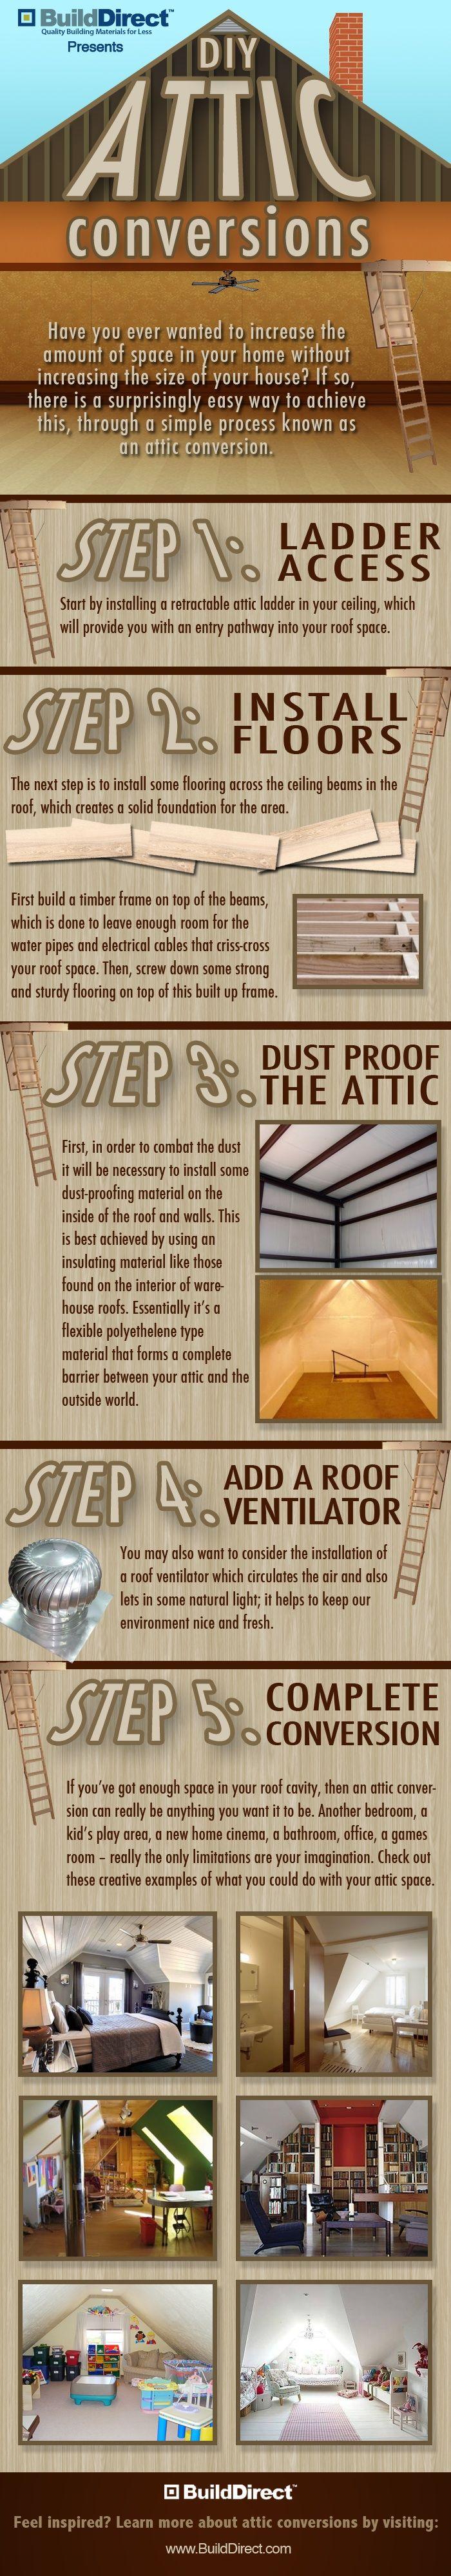 DIY Attic Conversions: Building Value